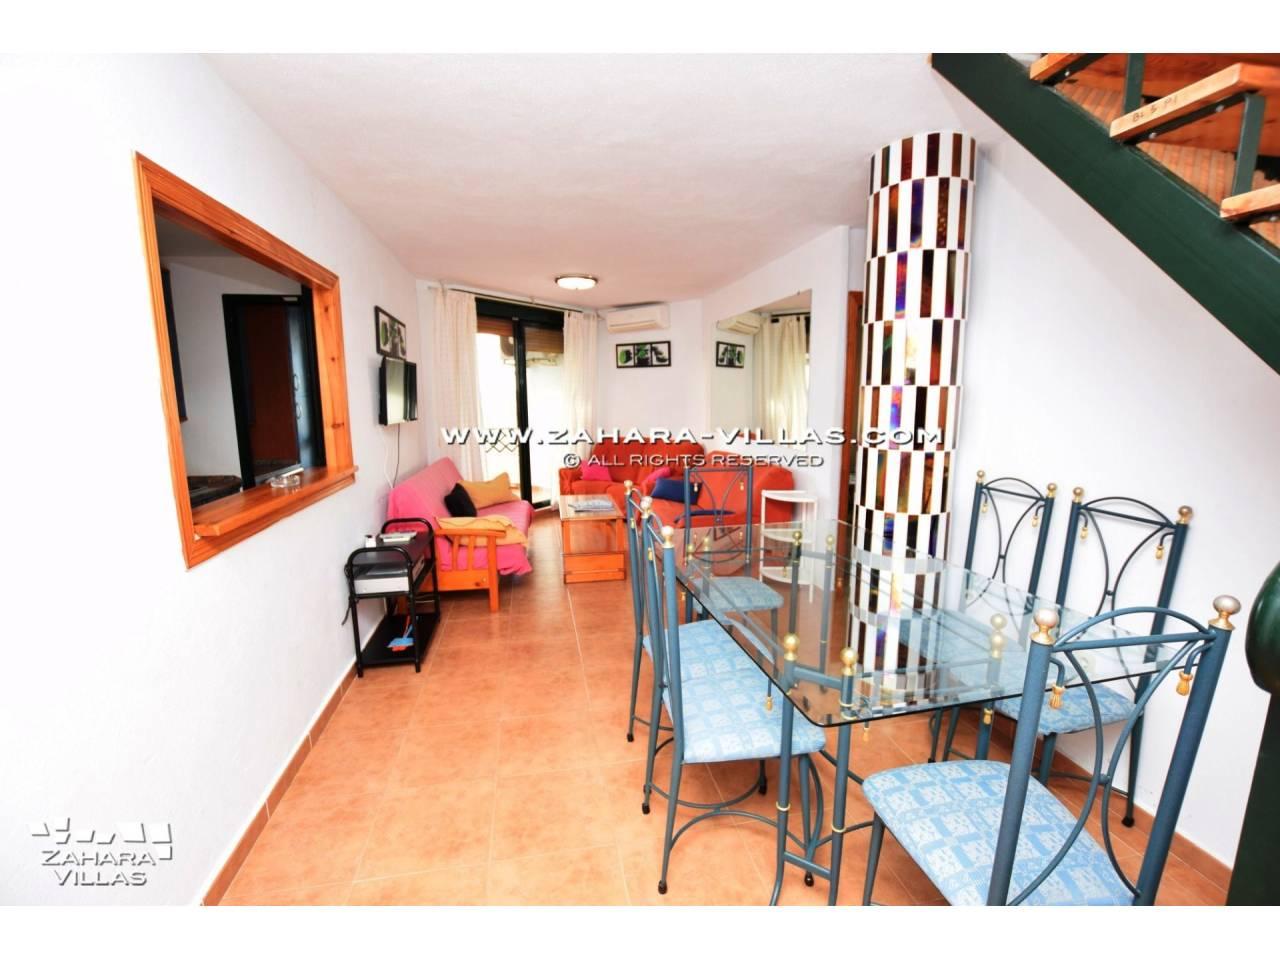 Imagen 11 de Penthouse for sale in Zahara de los Atunes